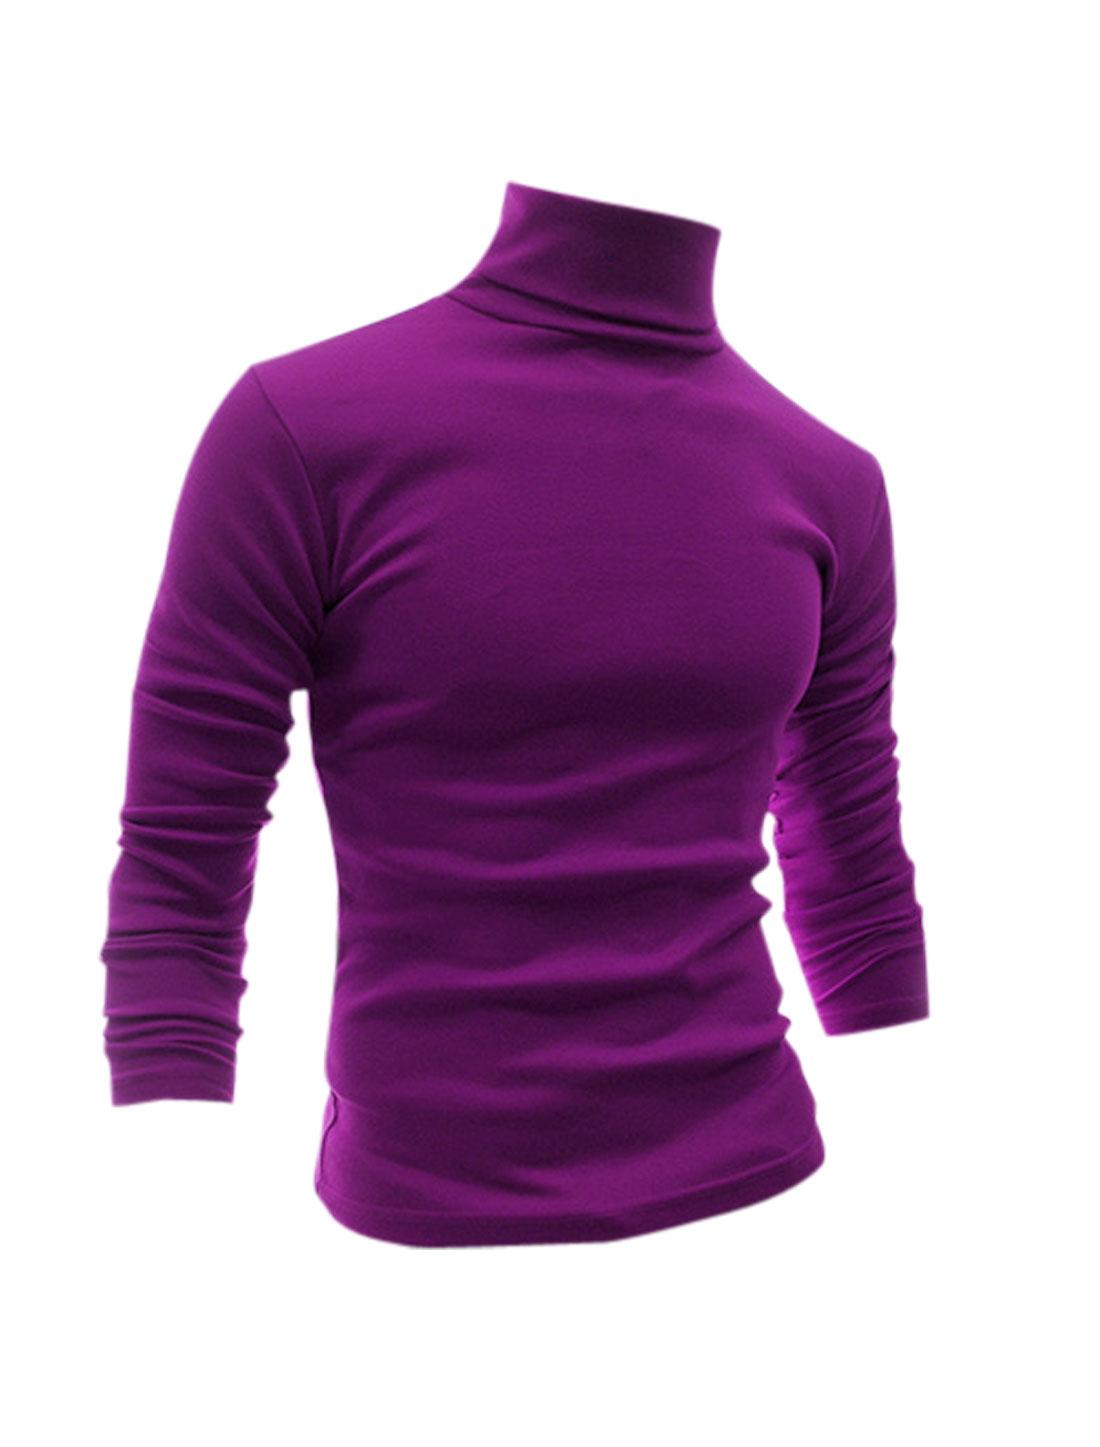 Men Turtle Neck Long Sleeves Slim Fit T-Shirt Purple S